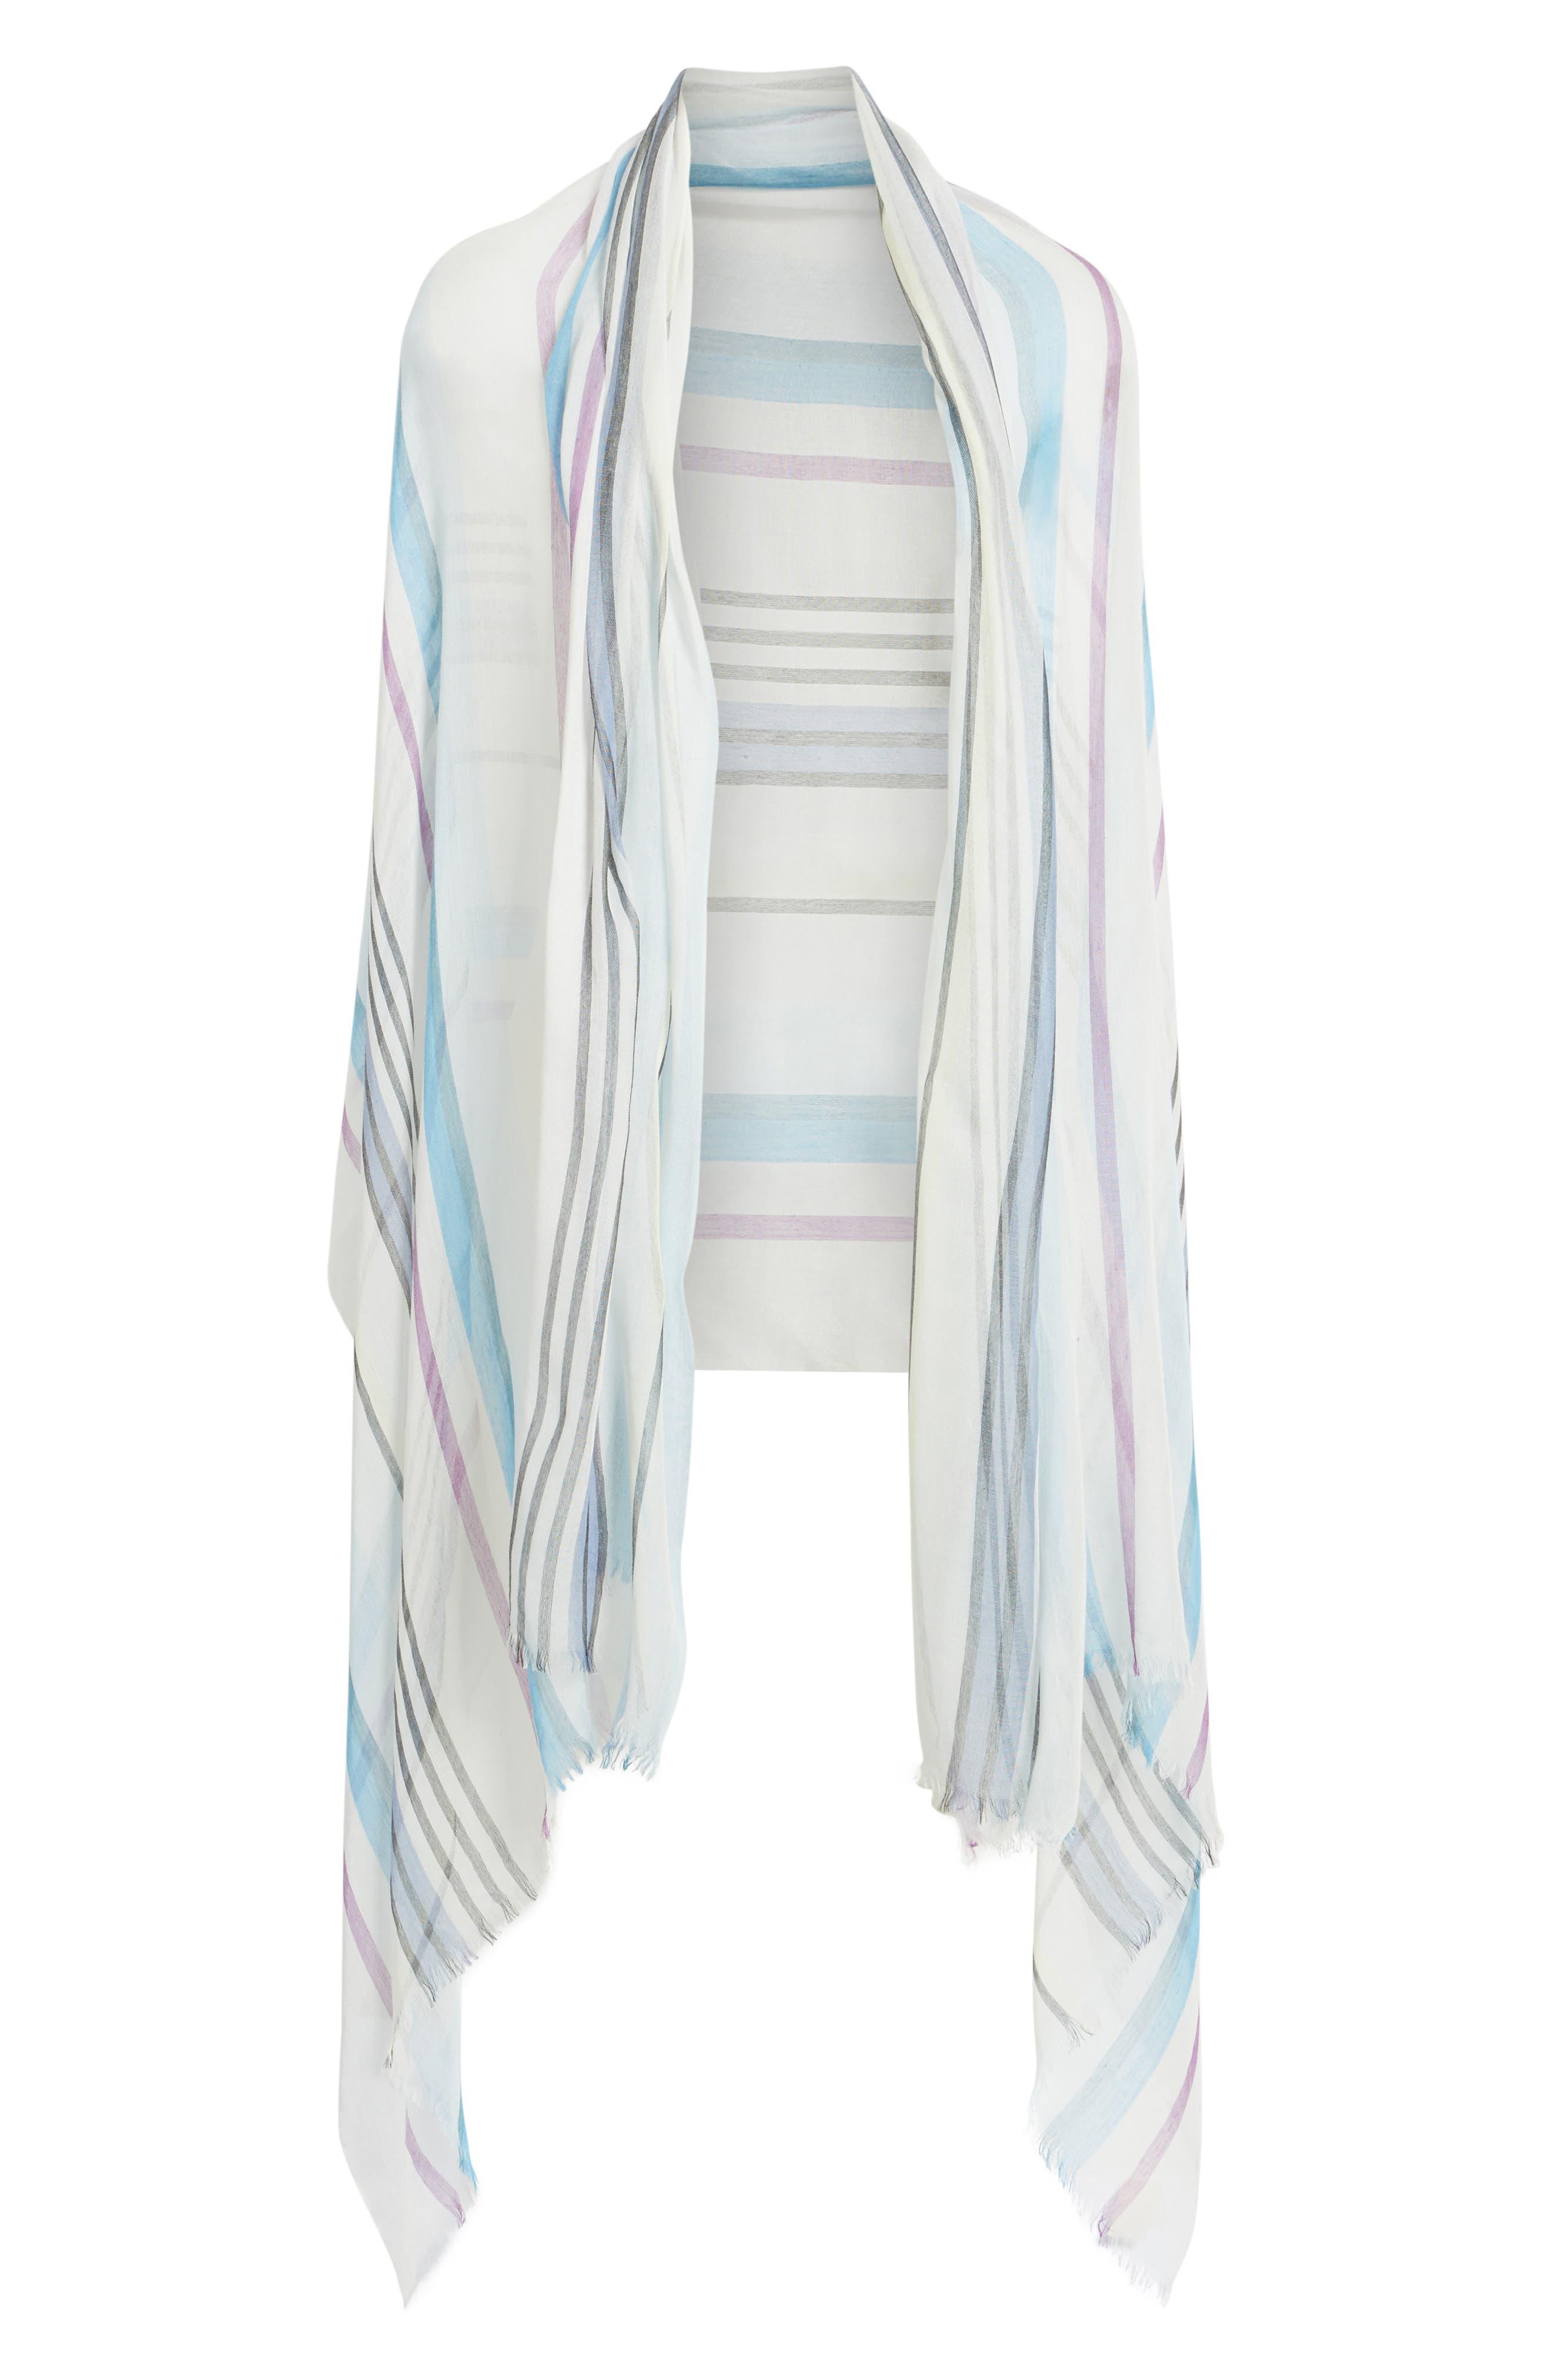 Yarn Dyed Stripe Wrap,                             Alternate thumbnail 2, color,                             Blue Combo Fresh Stripes